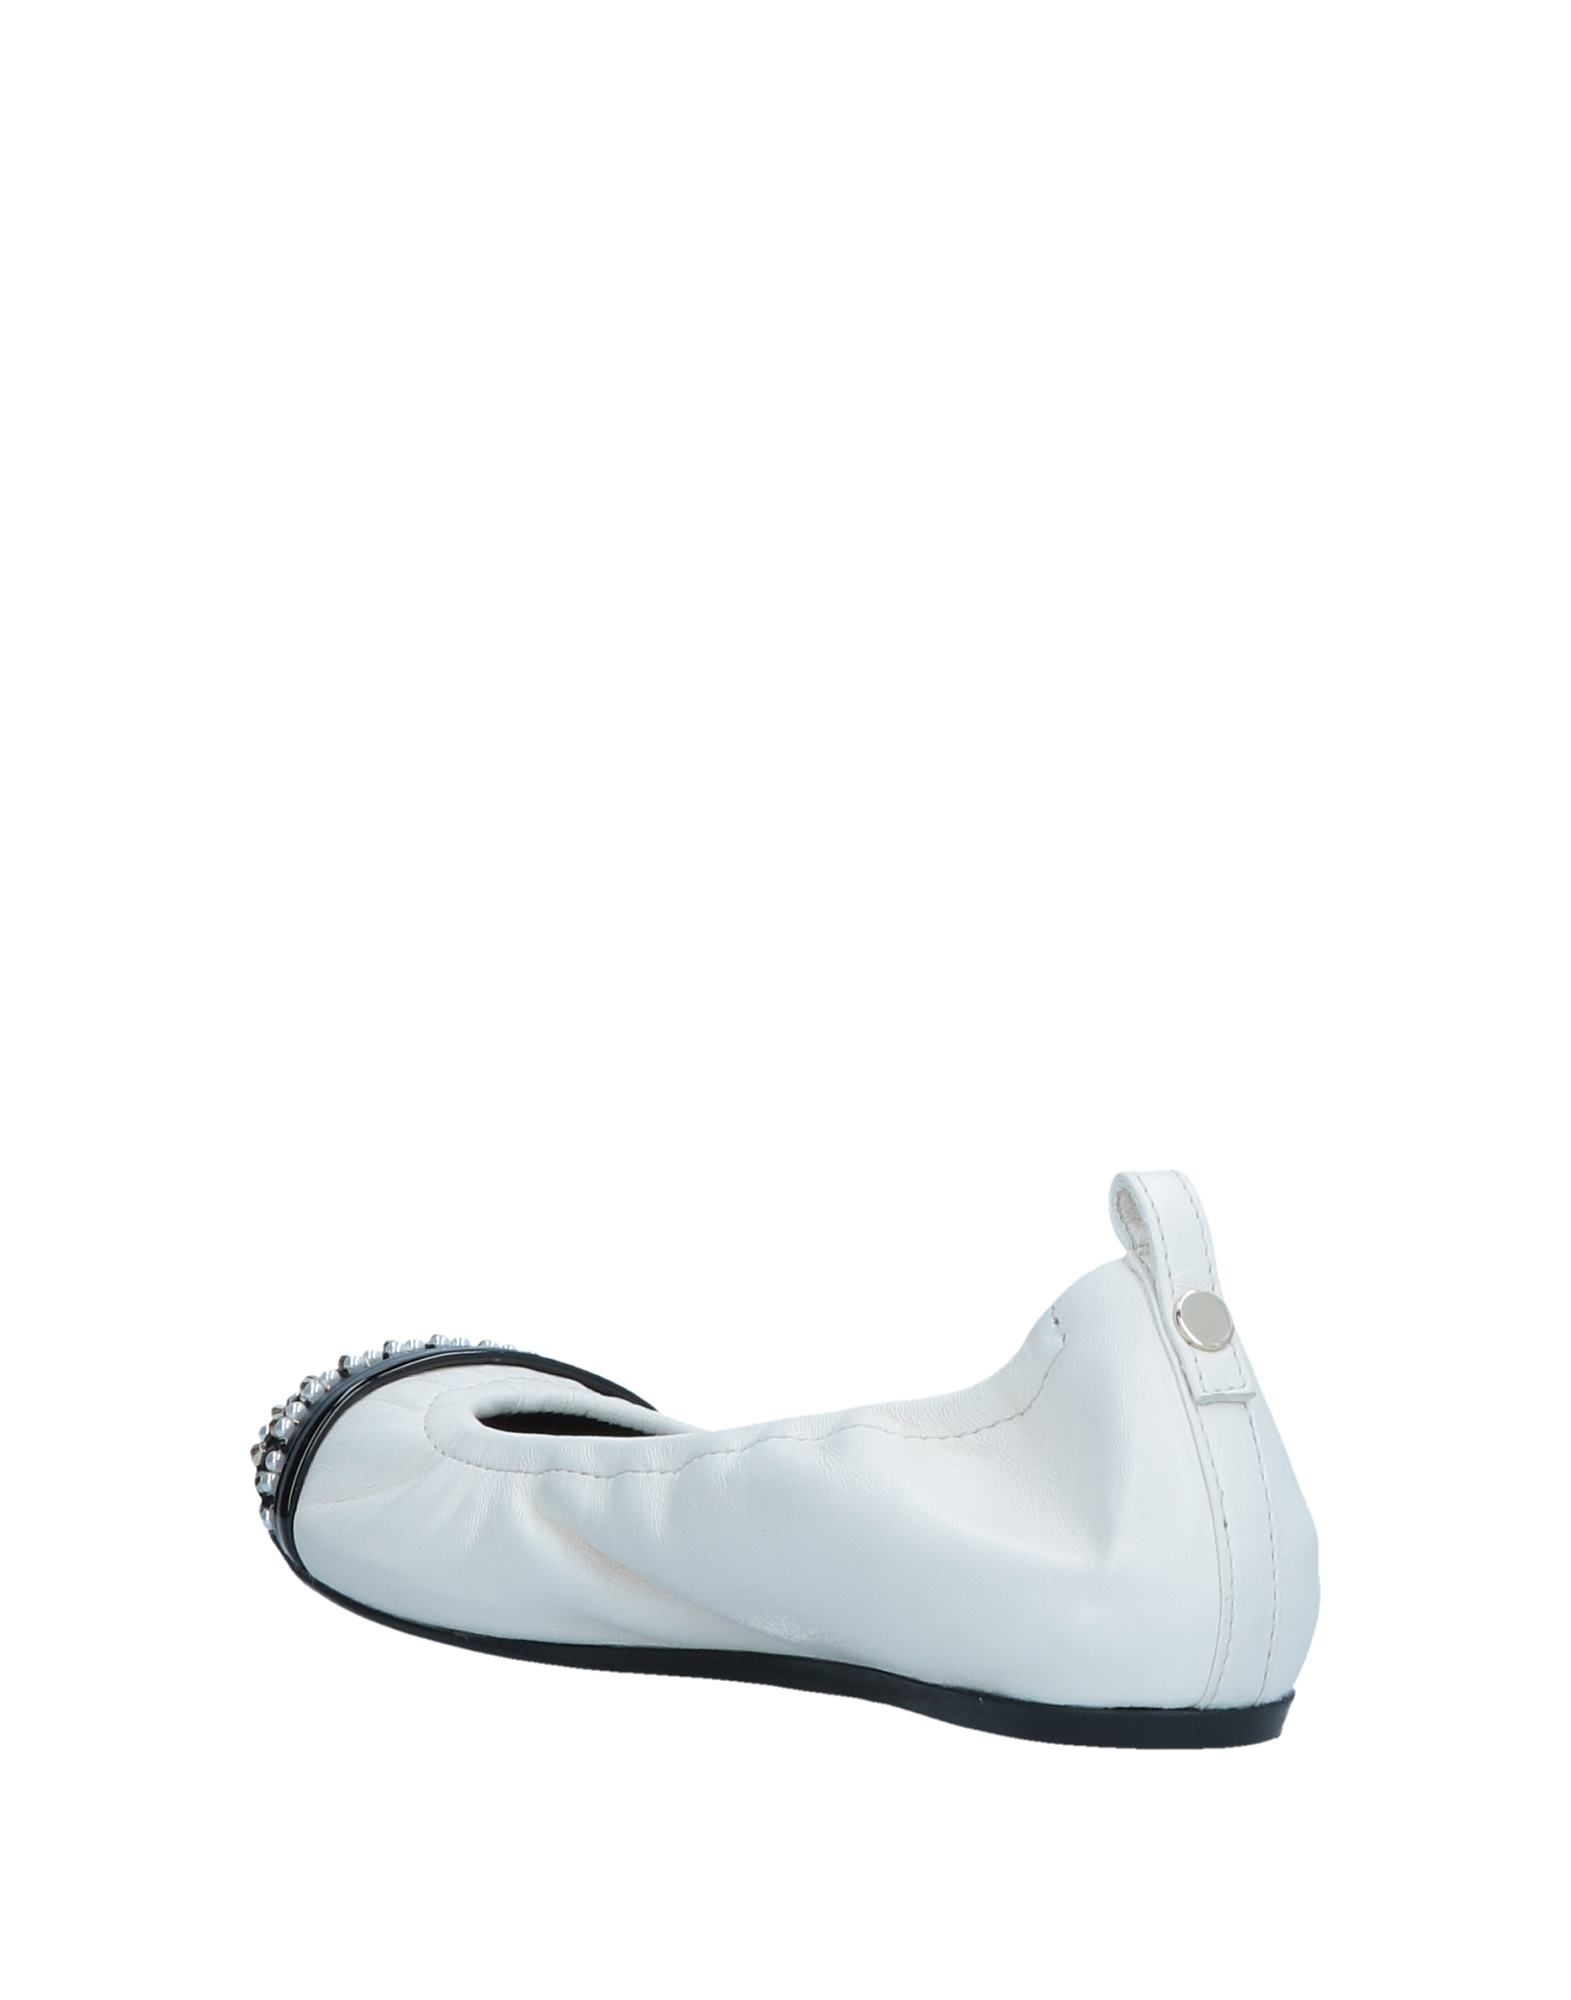 Rabatt Schuhe Lanvin Damen Ballerinas Damen Lanvin  11475667EA 6d9f6b